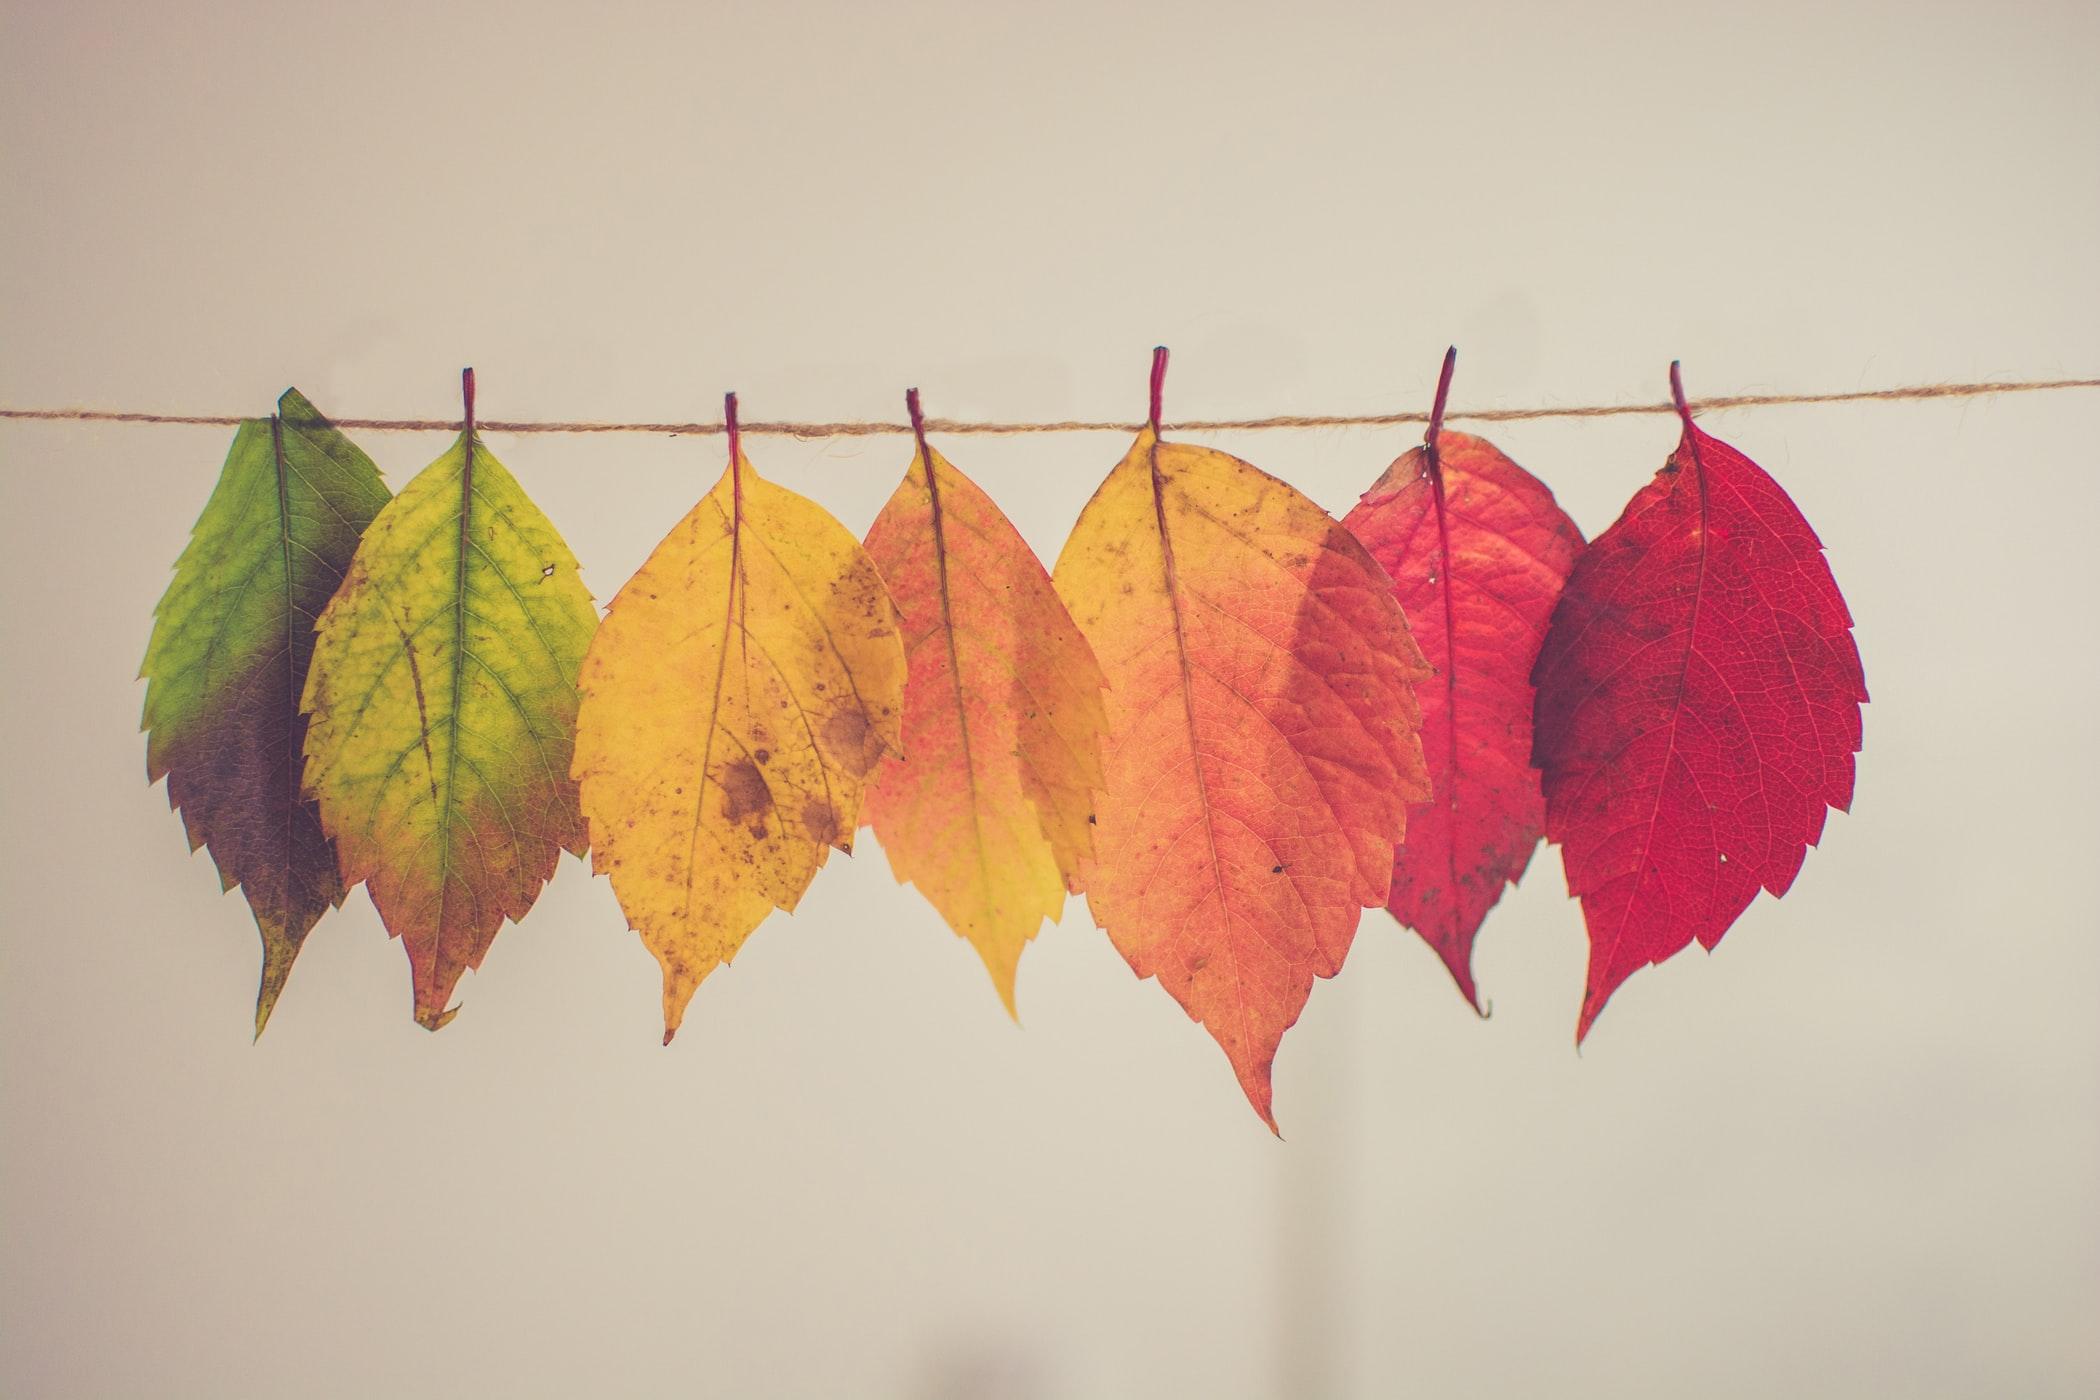 10 kreative DIY Herbstdeko Ideen